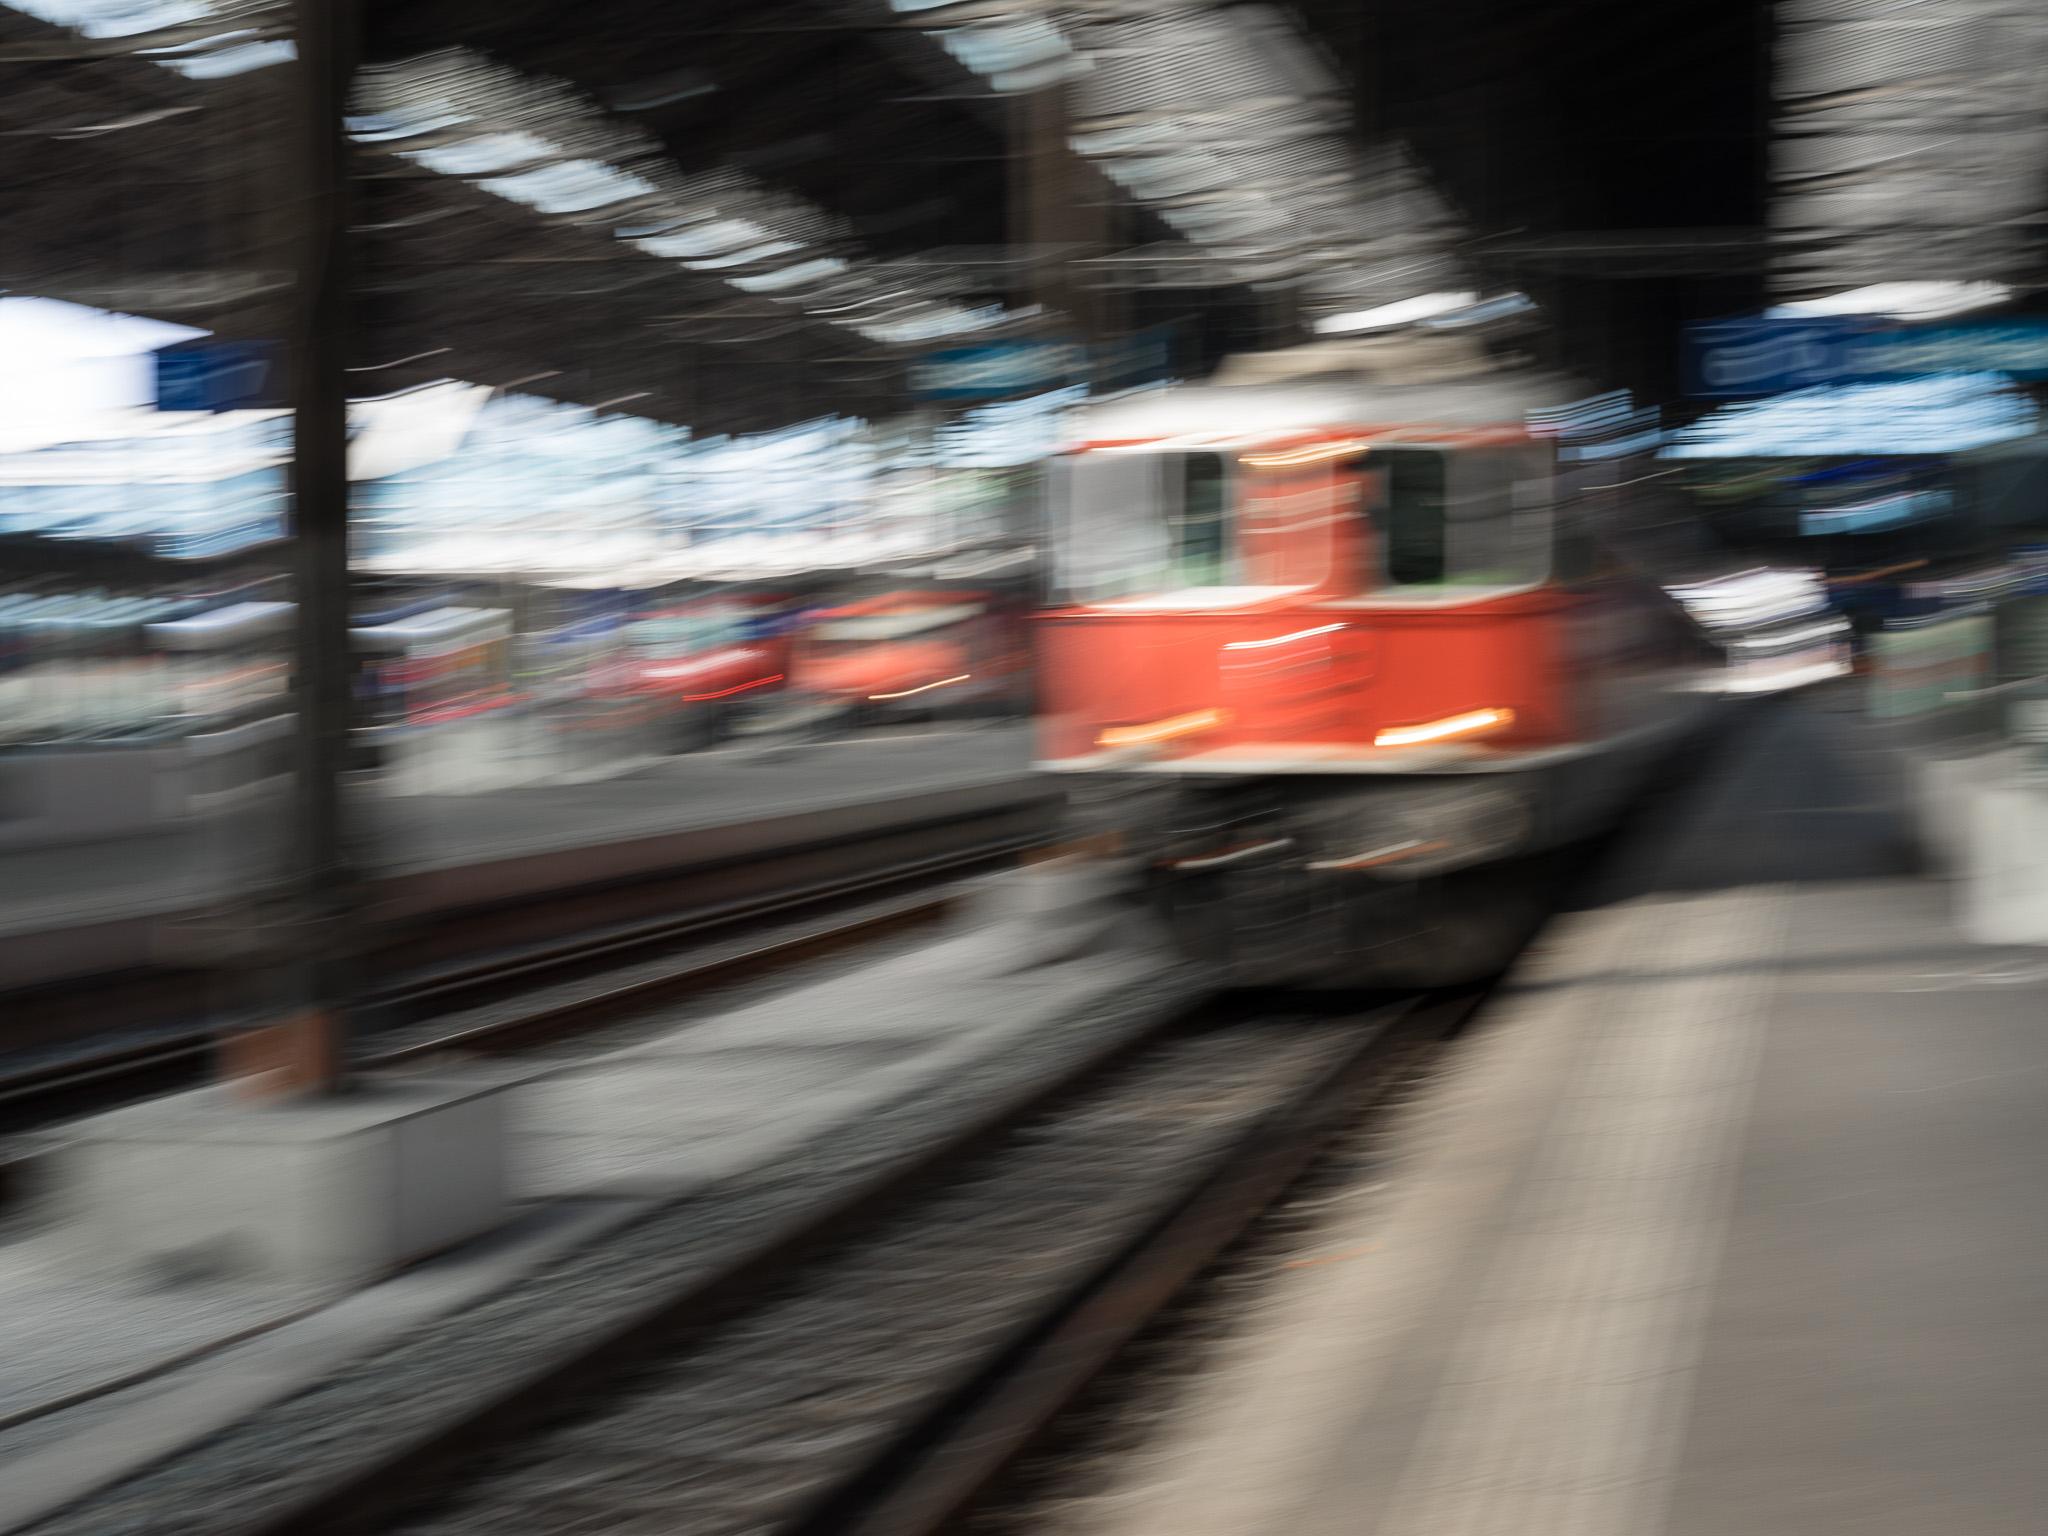 06-Basel-0013-P-1503.jpg